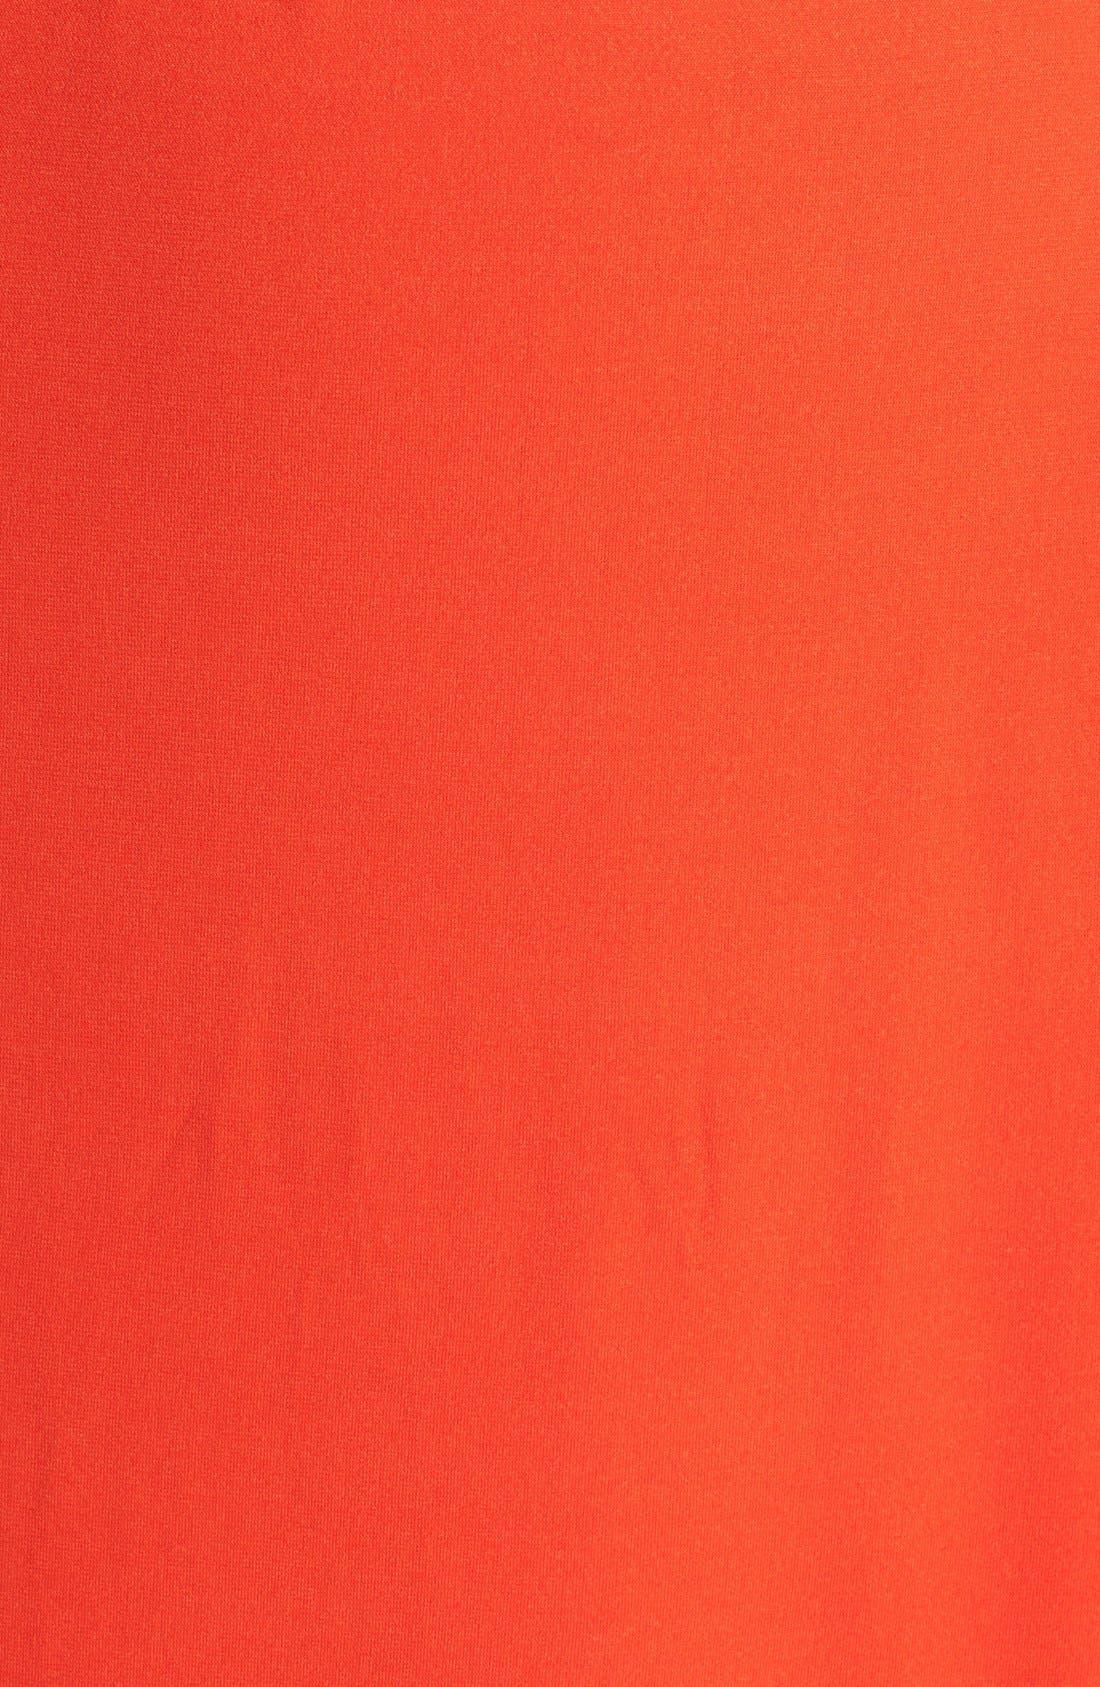 Alternate Image 3  - City Chic 'Grecian' Faux Leather Trim Keyhole Maxi Dress (Plus Size)